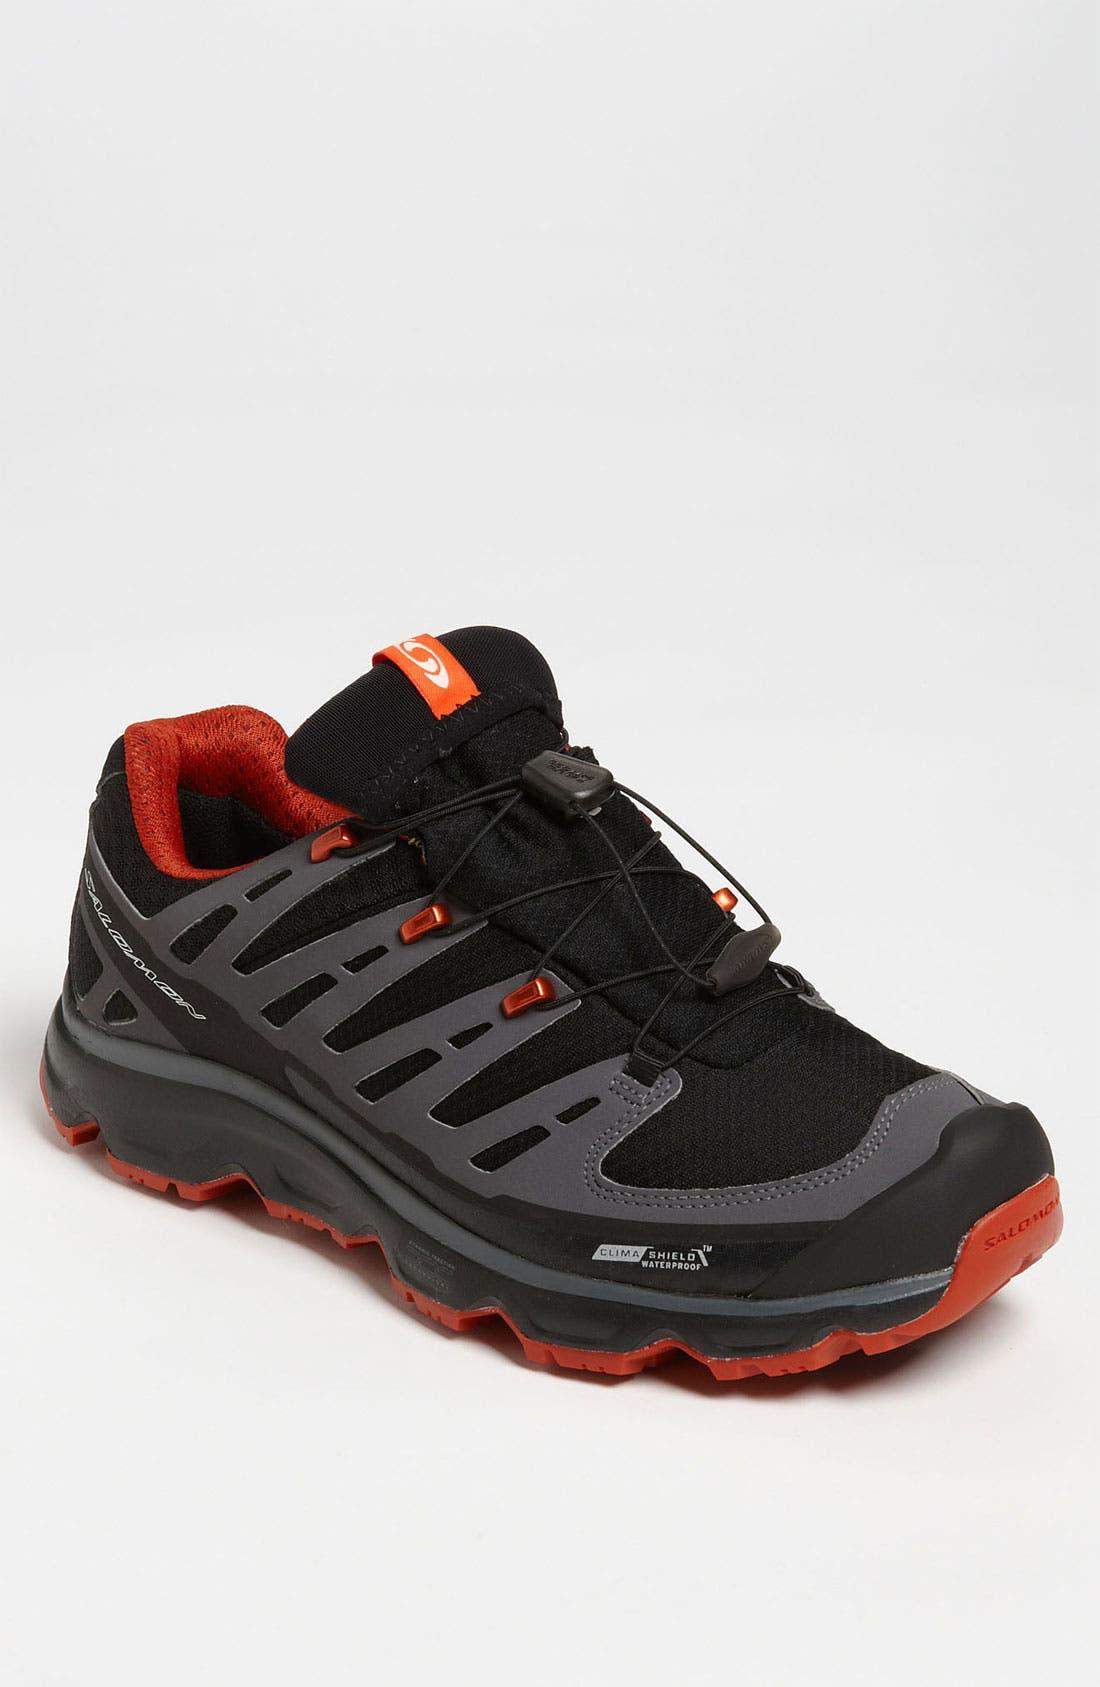 Alternate Image 1 Selected - Salomon 'Synapse CS' Hiking Shoe (Men)